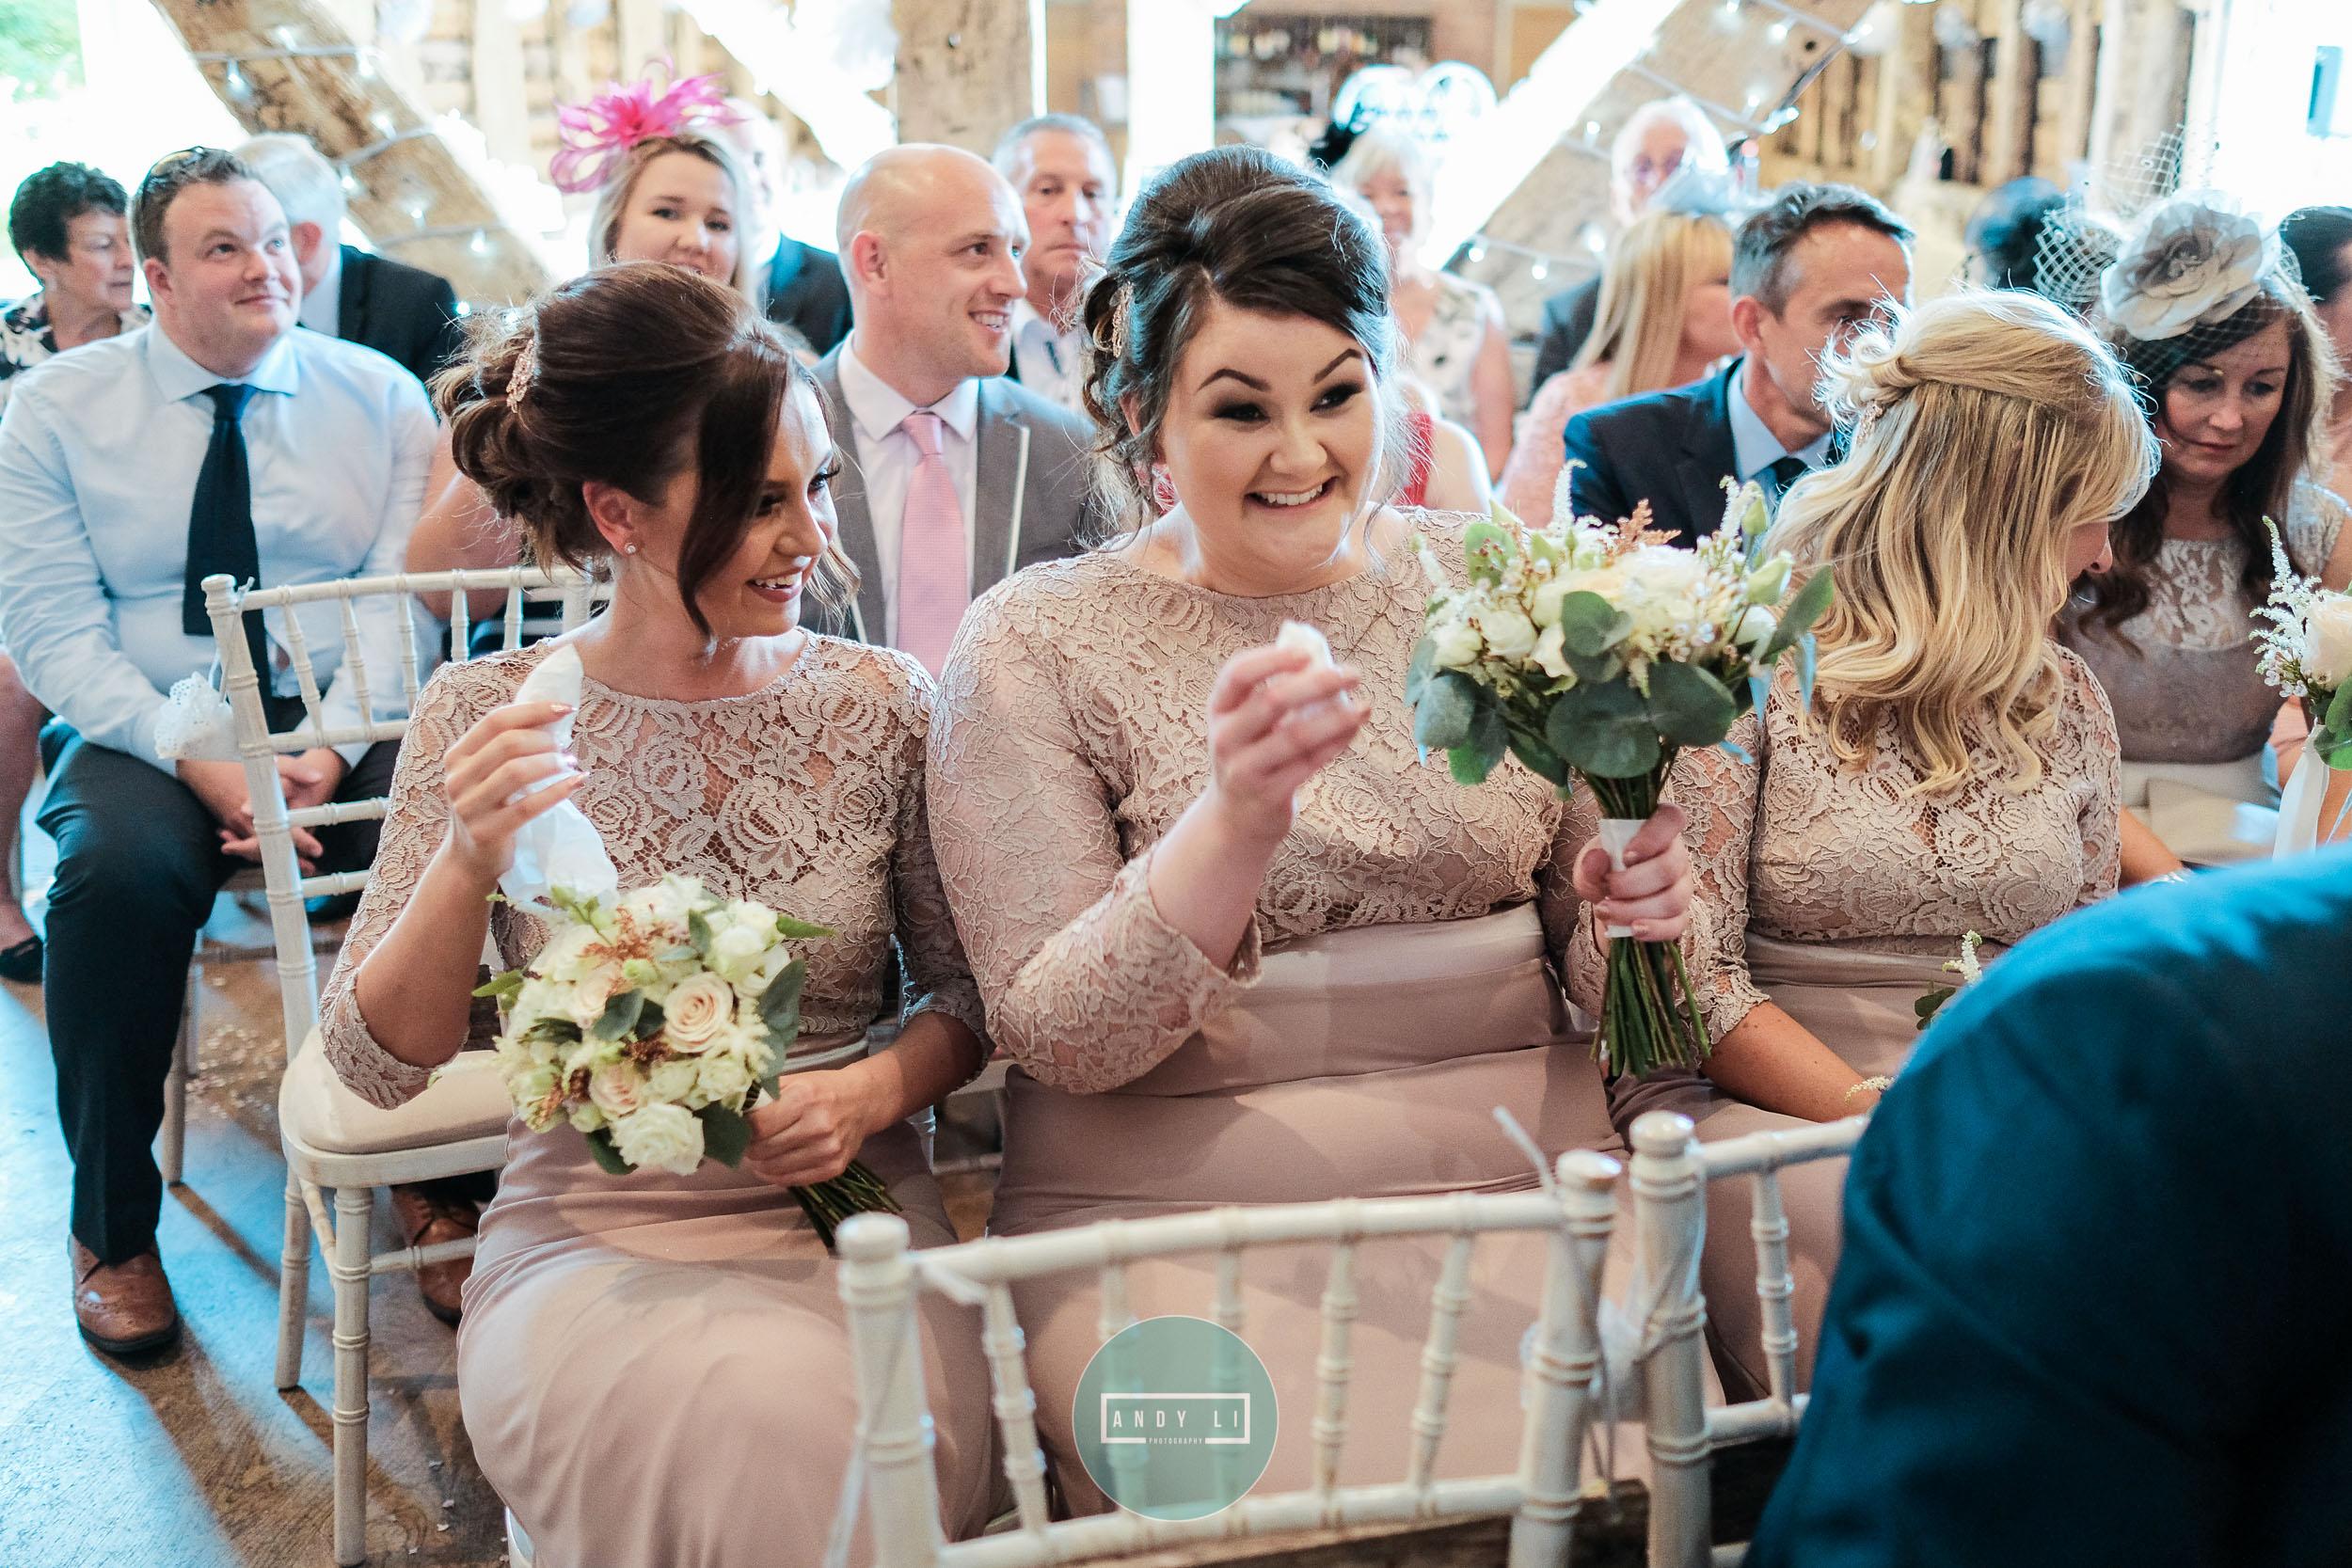 Pimhill Barn Wedding Photographer-066-DSCF0347.jpg